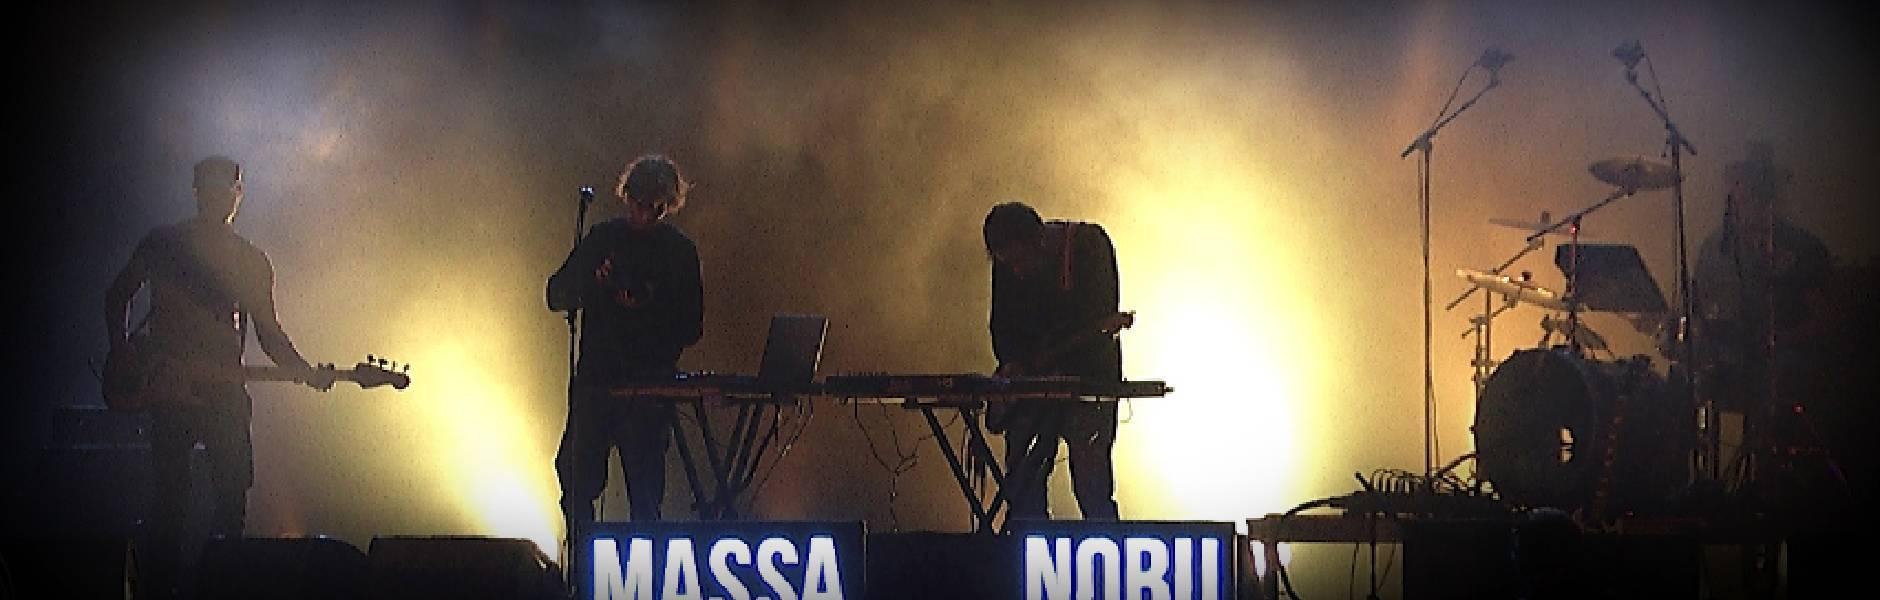 Massa Nobu